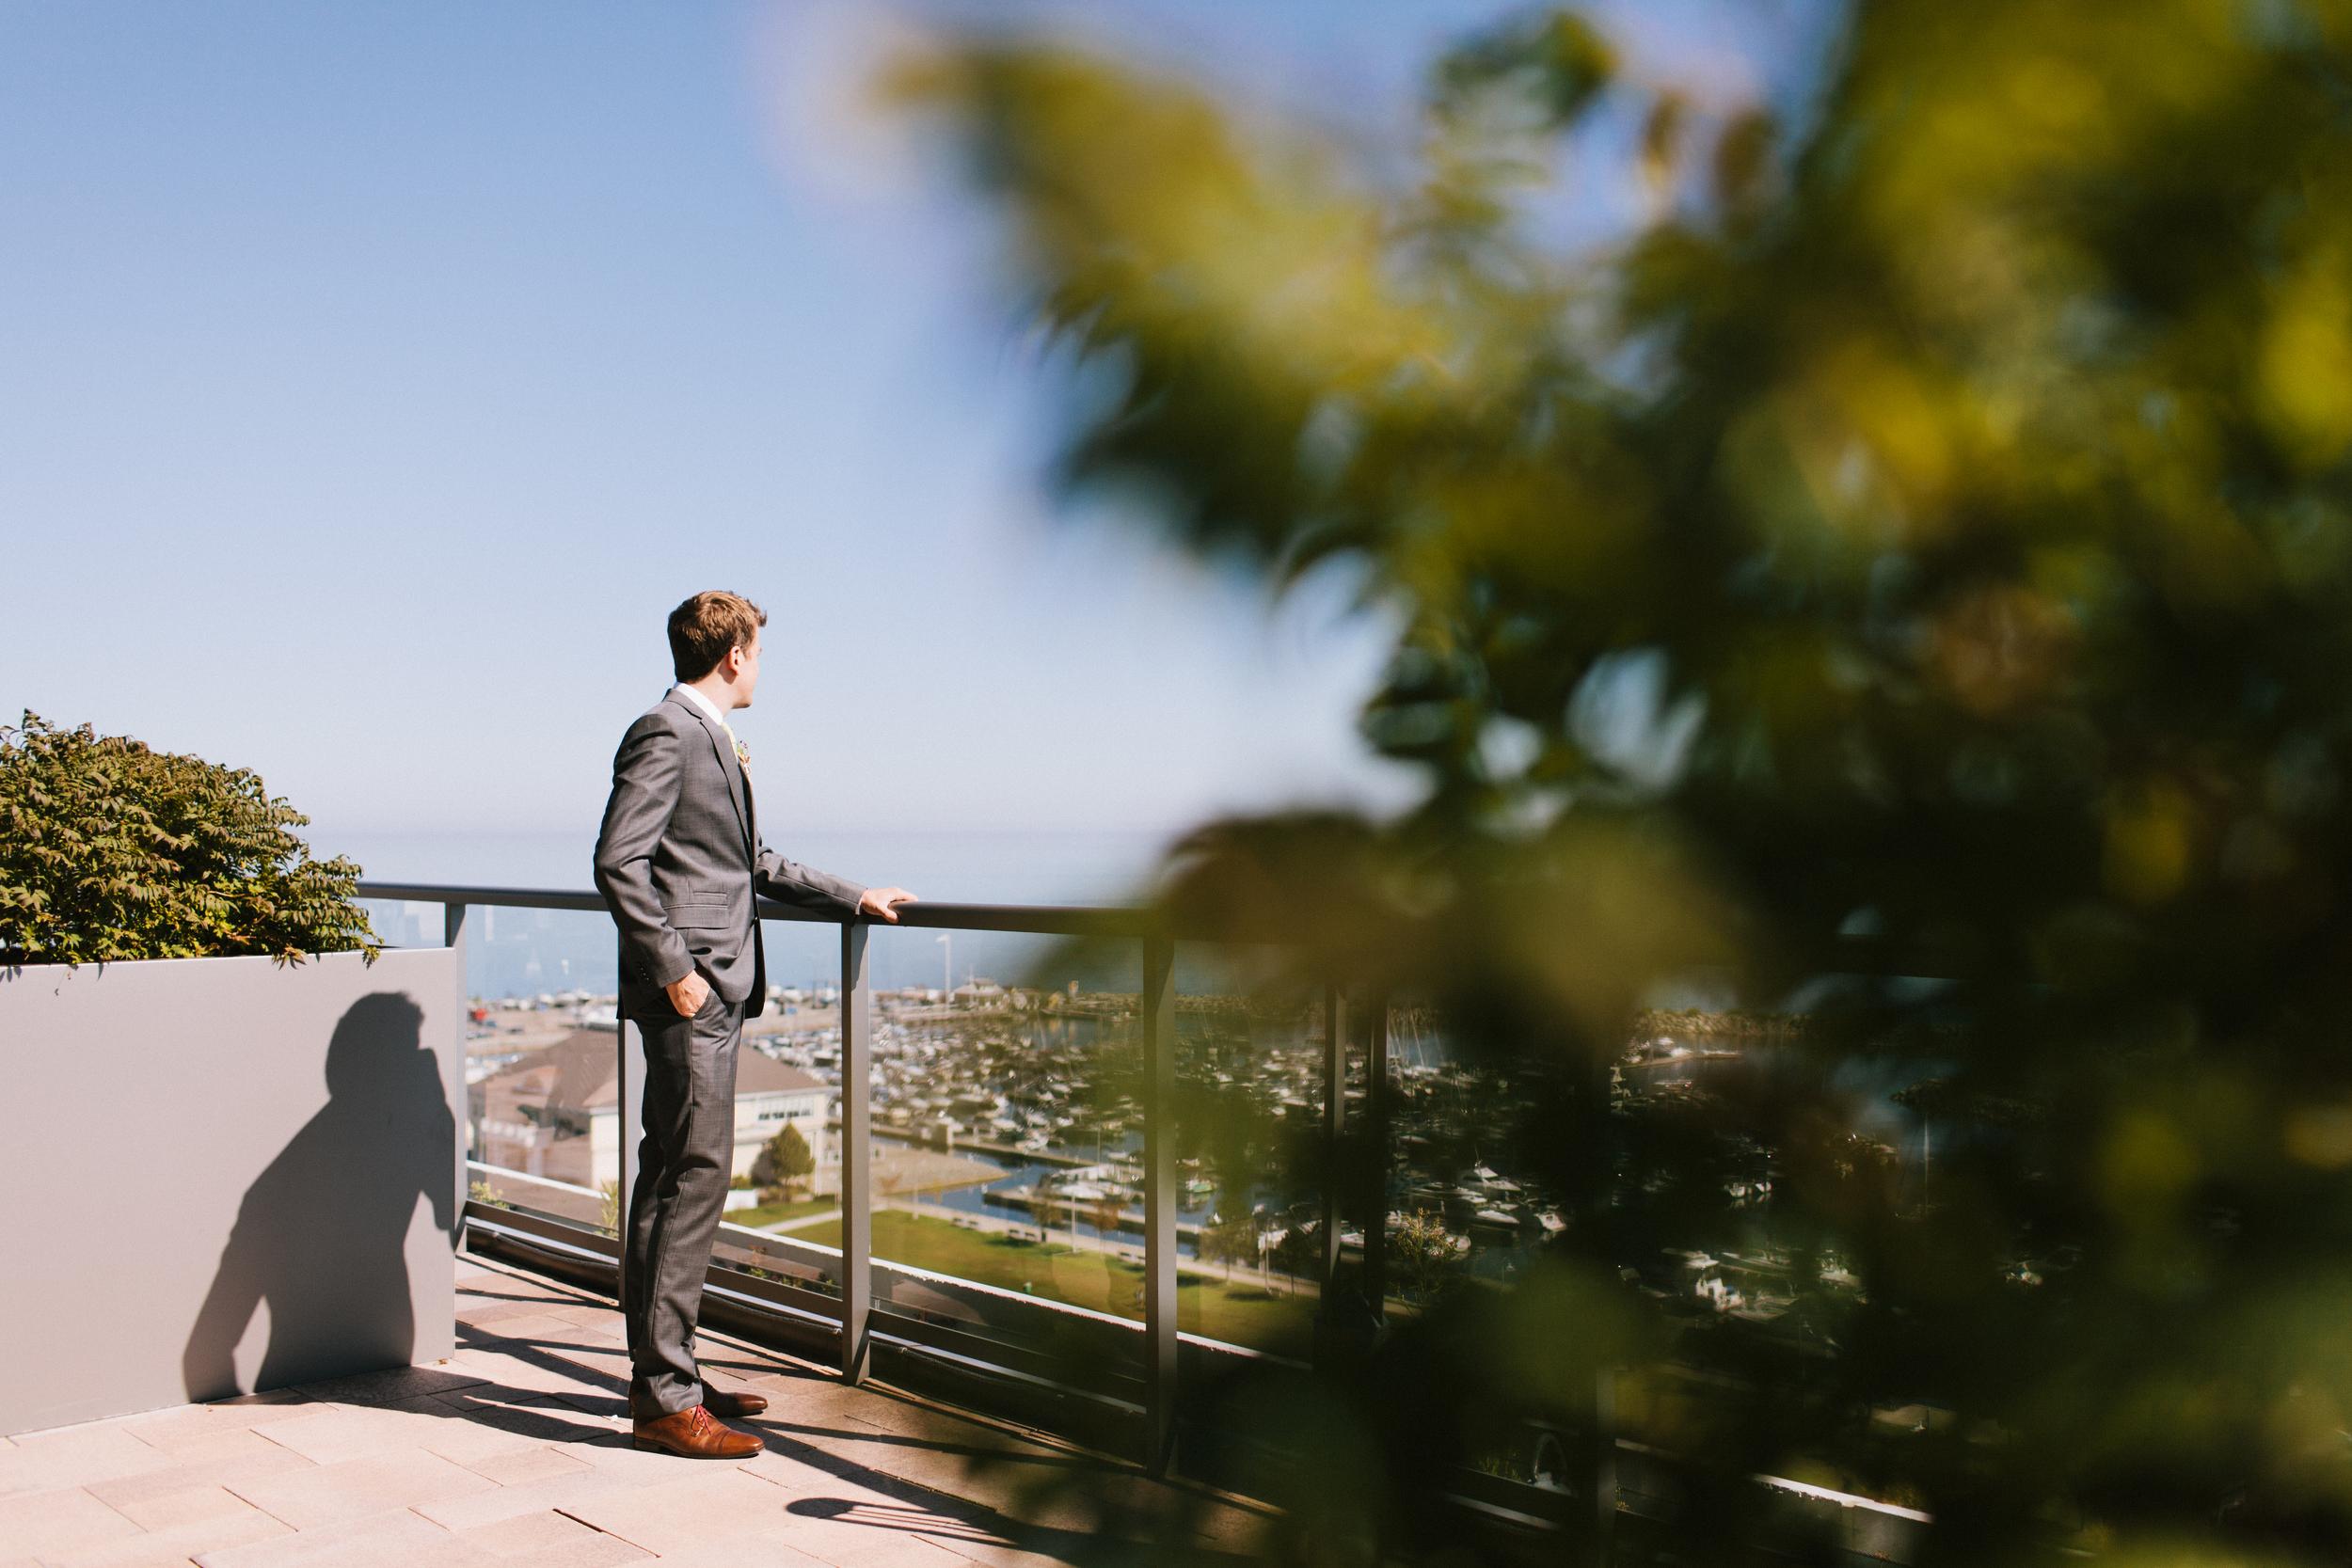 harbour-banquet-hall-oakville-wedding-photographer-michael-rousseau-photography-persian-wedding-photographer-isabella-daniel004.JPG